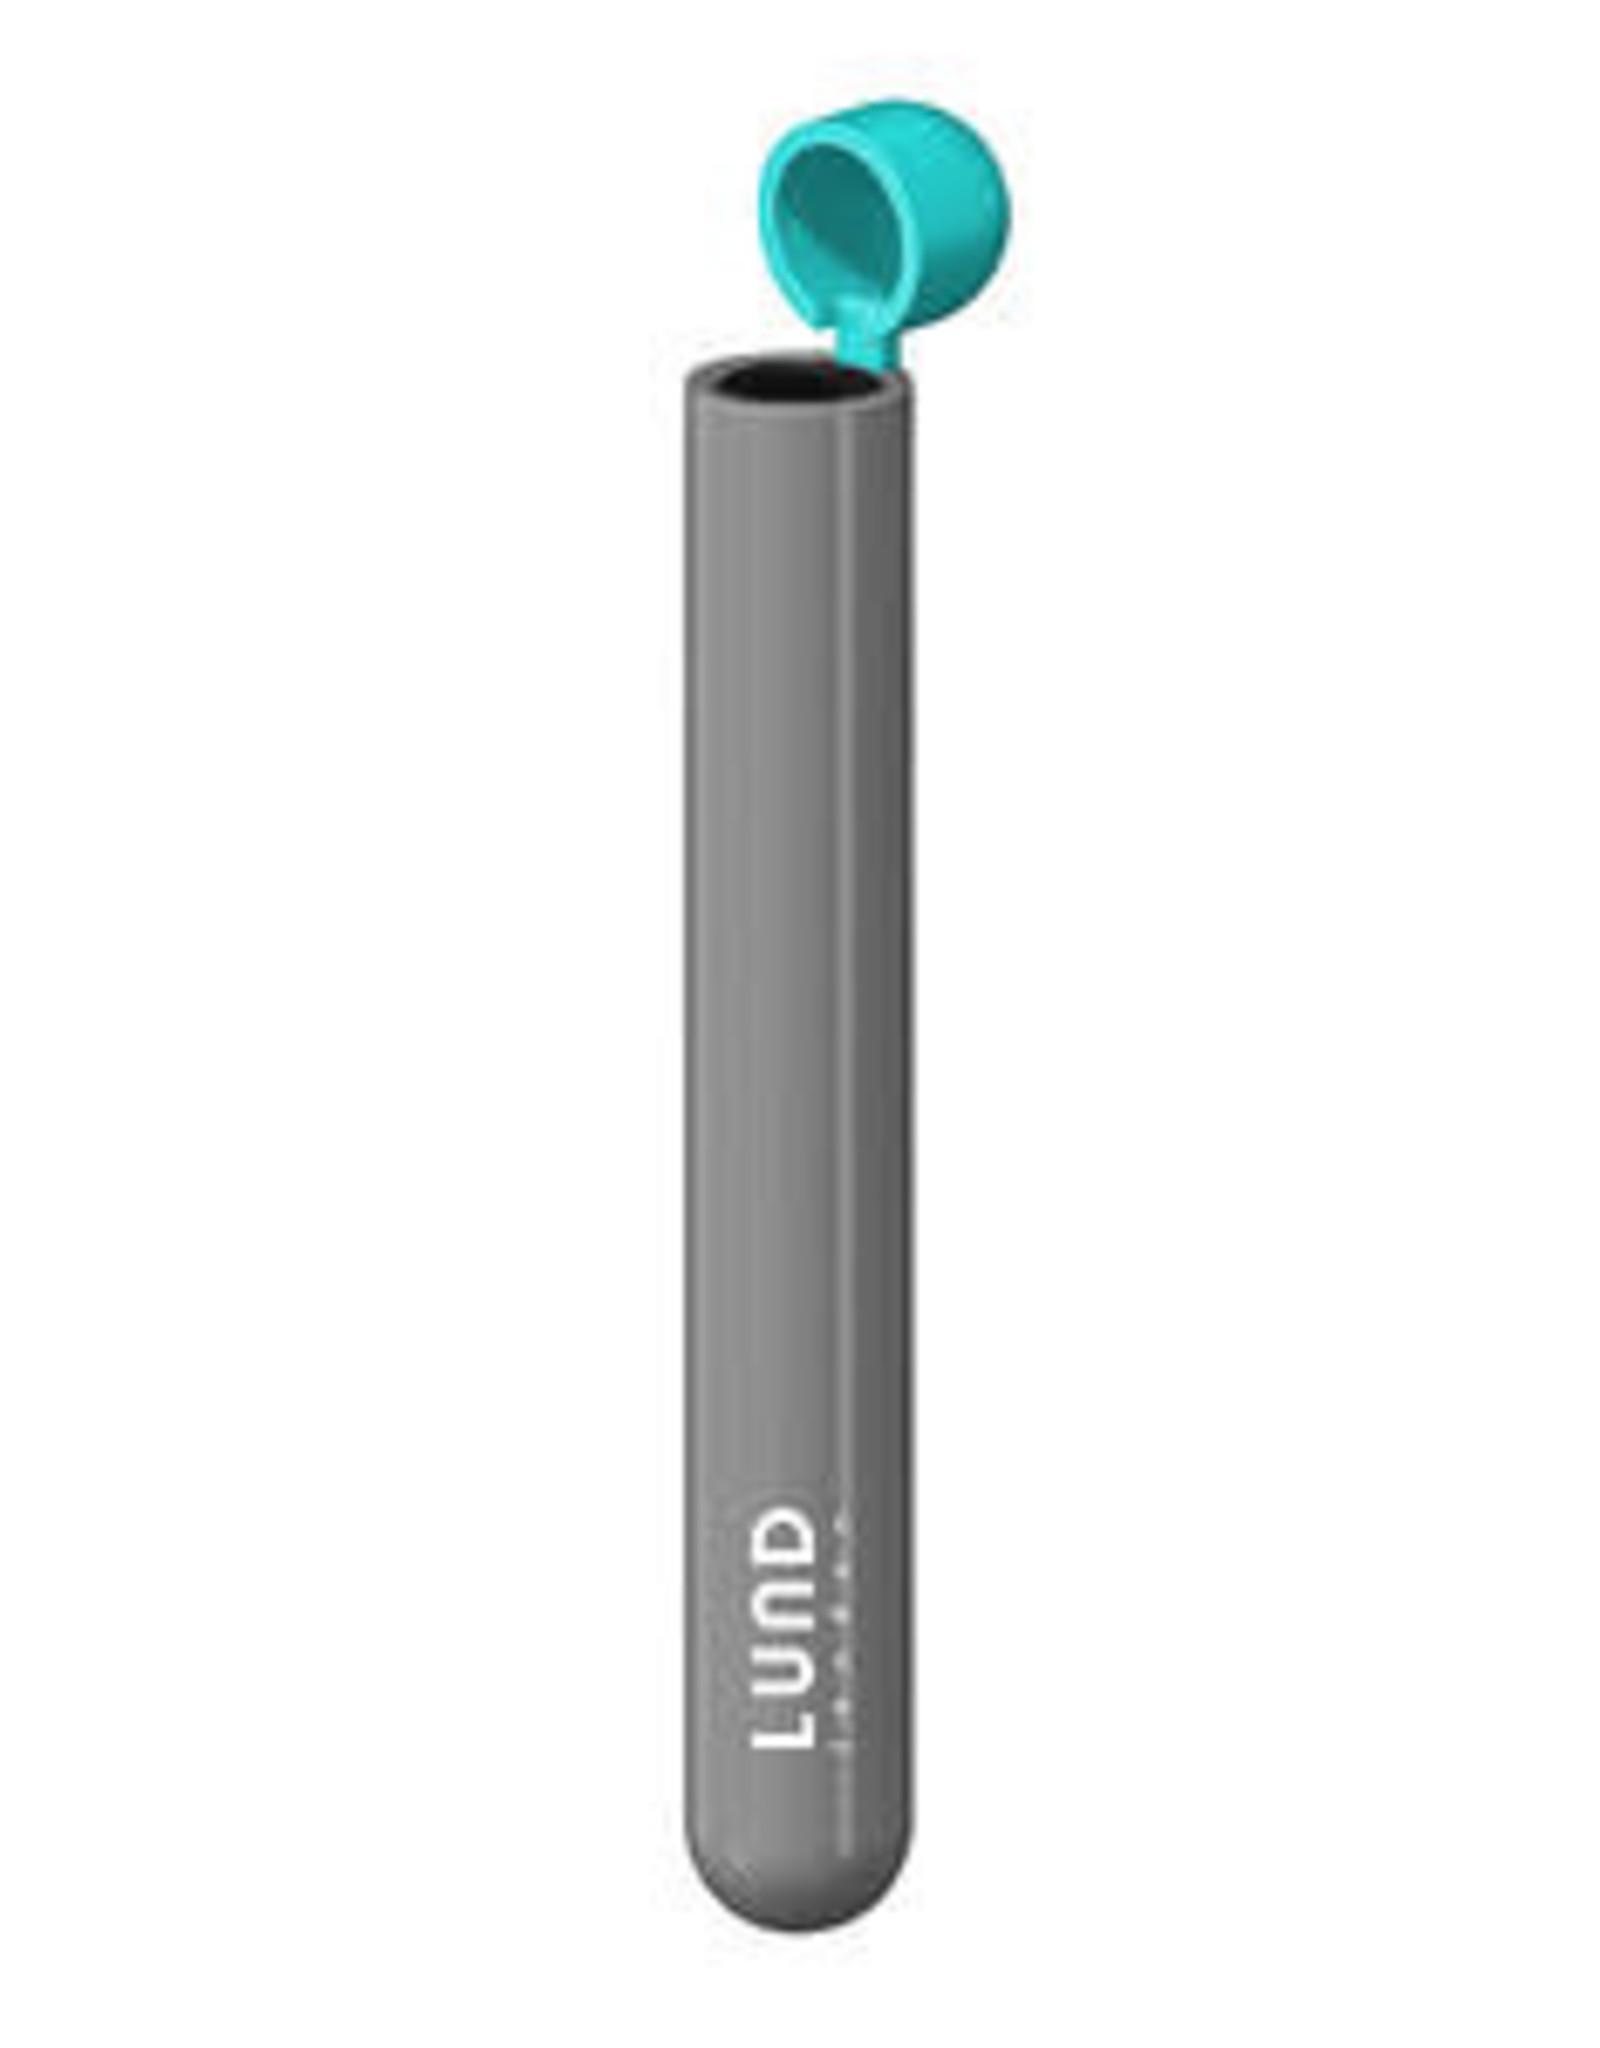 Lund London Ltd. Skittle Straws for Life w/Travel Case-Grey